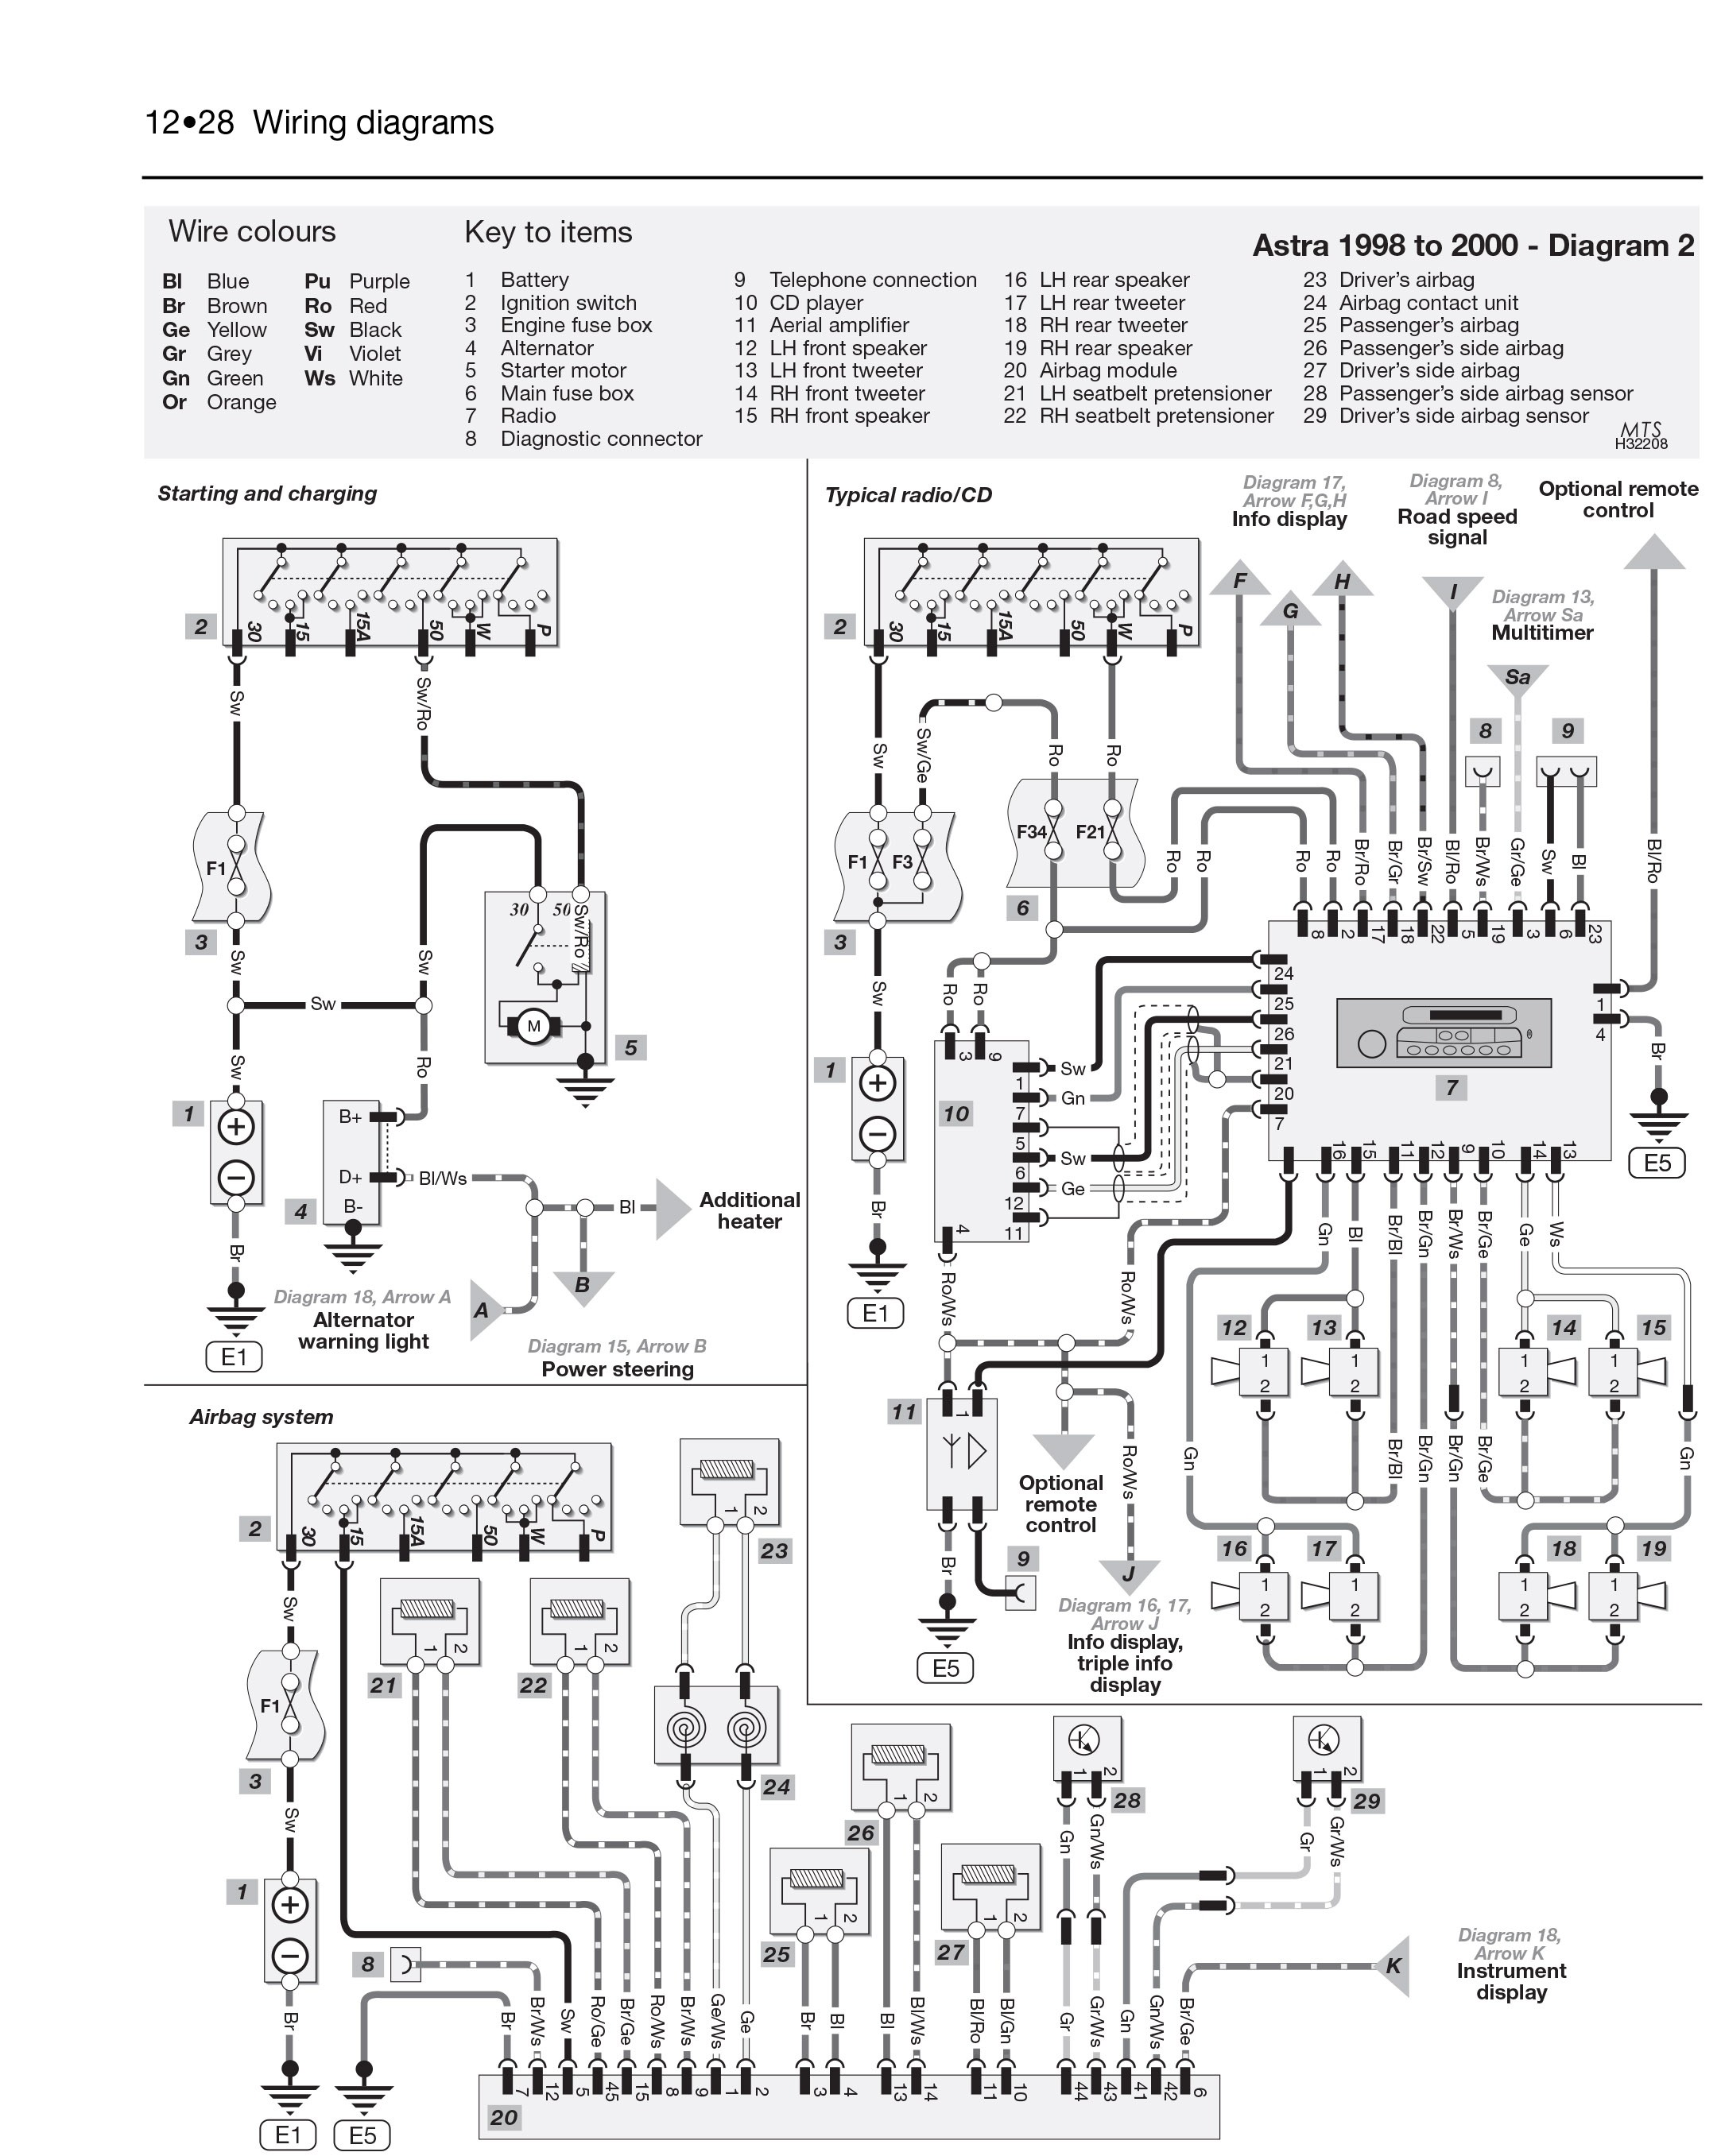 21 opel omega b fuse box diagram books of wiring diagram u2022 rh mattersoflifecoaching co opel corsa vauxhall zafira fuse box location wiring library